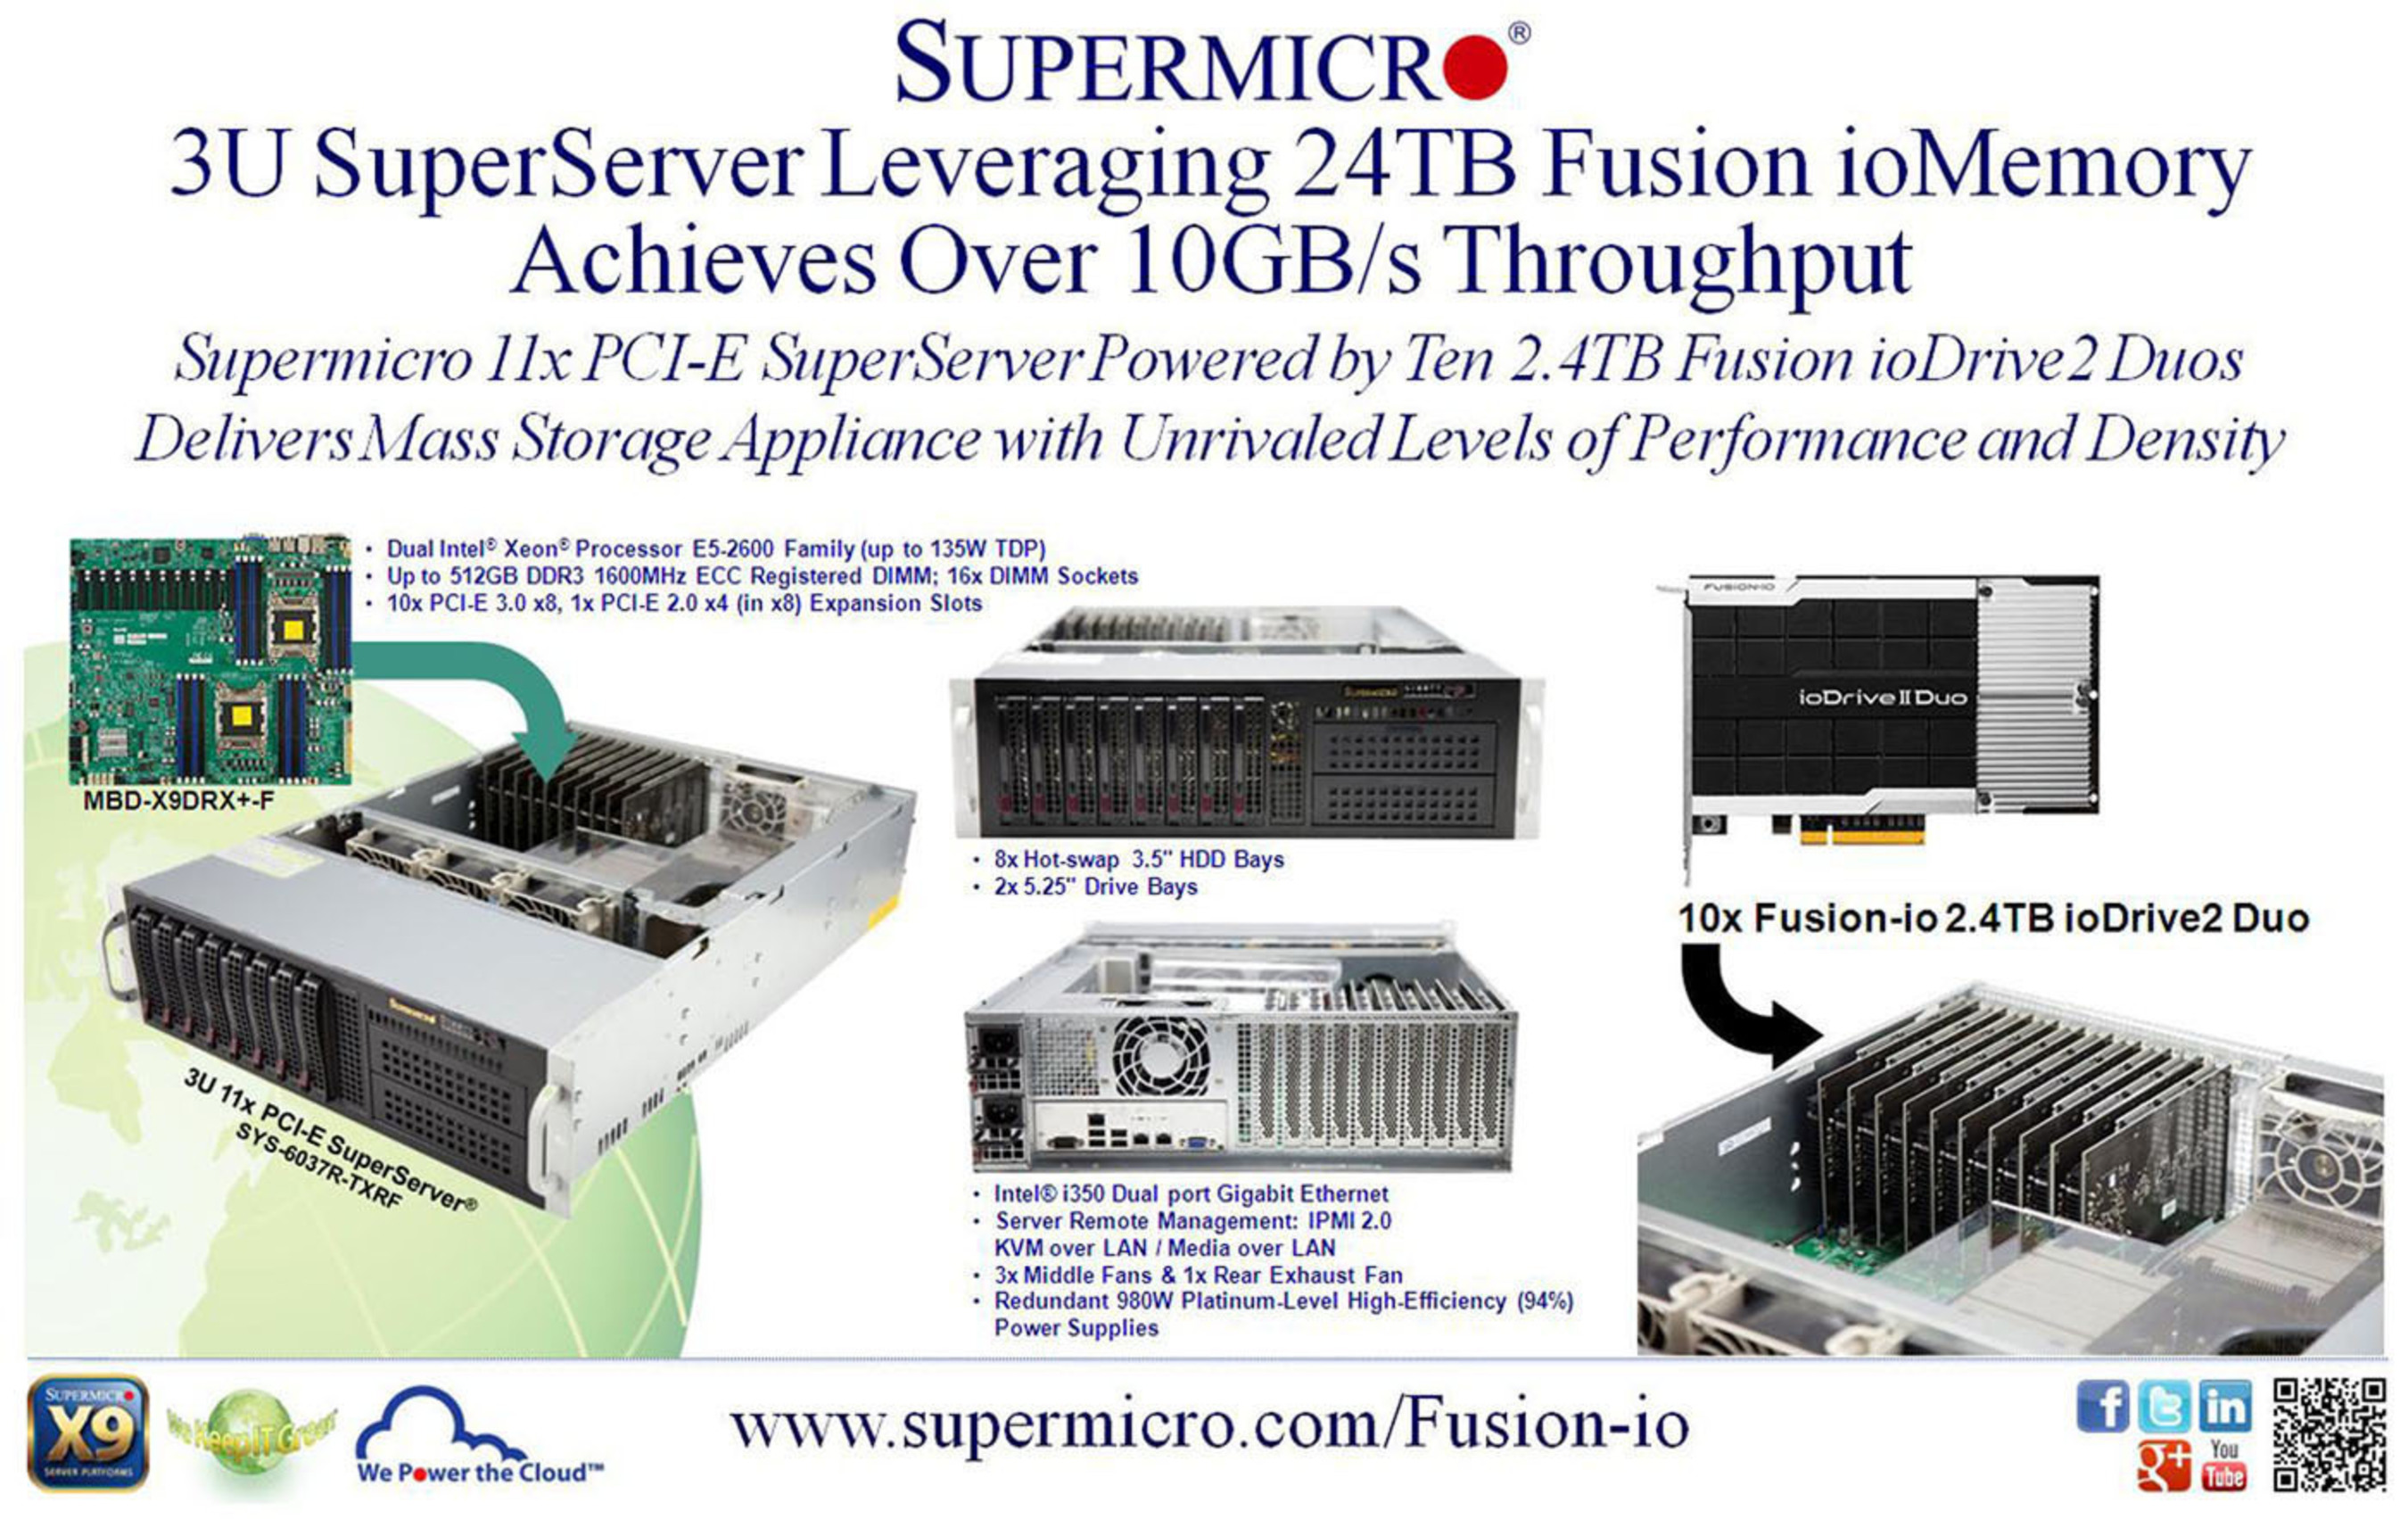 Supermicro(R) 3U SuperServer(R) w/Fusion ioMemory Achieves Over 10GB/s Throughput.  (PRNewsFoto/Super Micro Computer, Inc.)